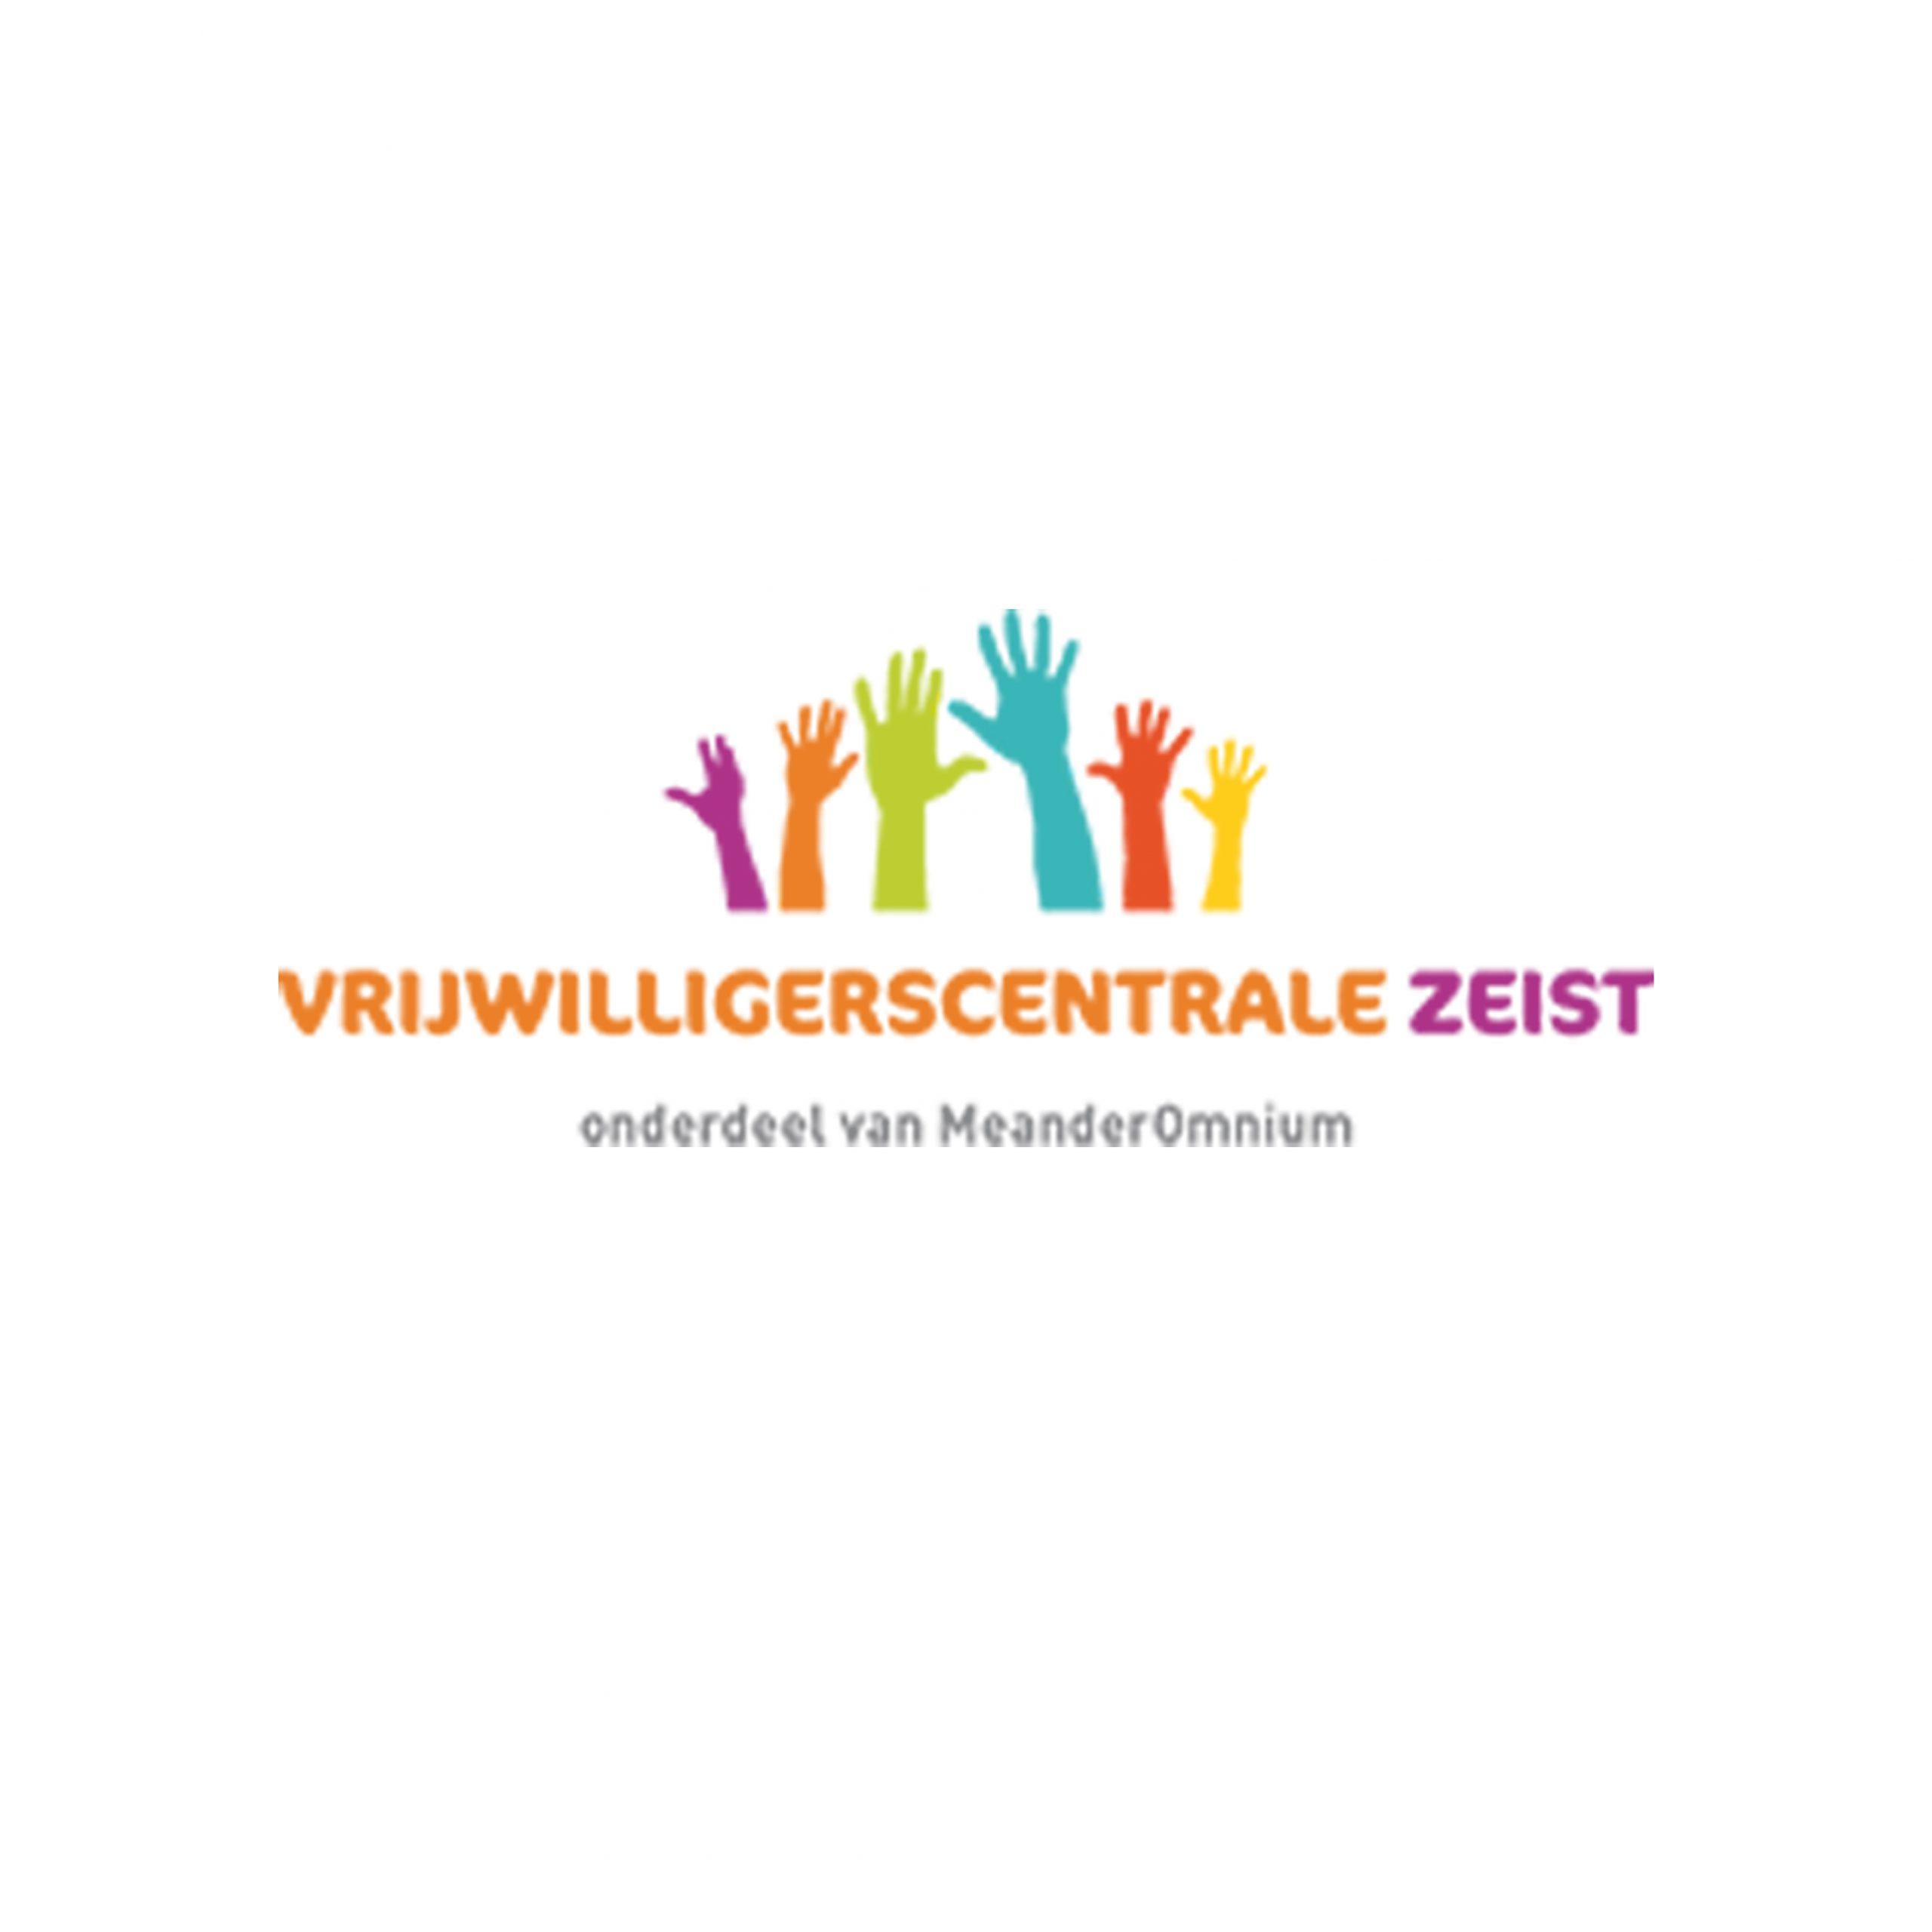 VrijwilligersCentrale Zeist